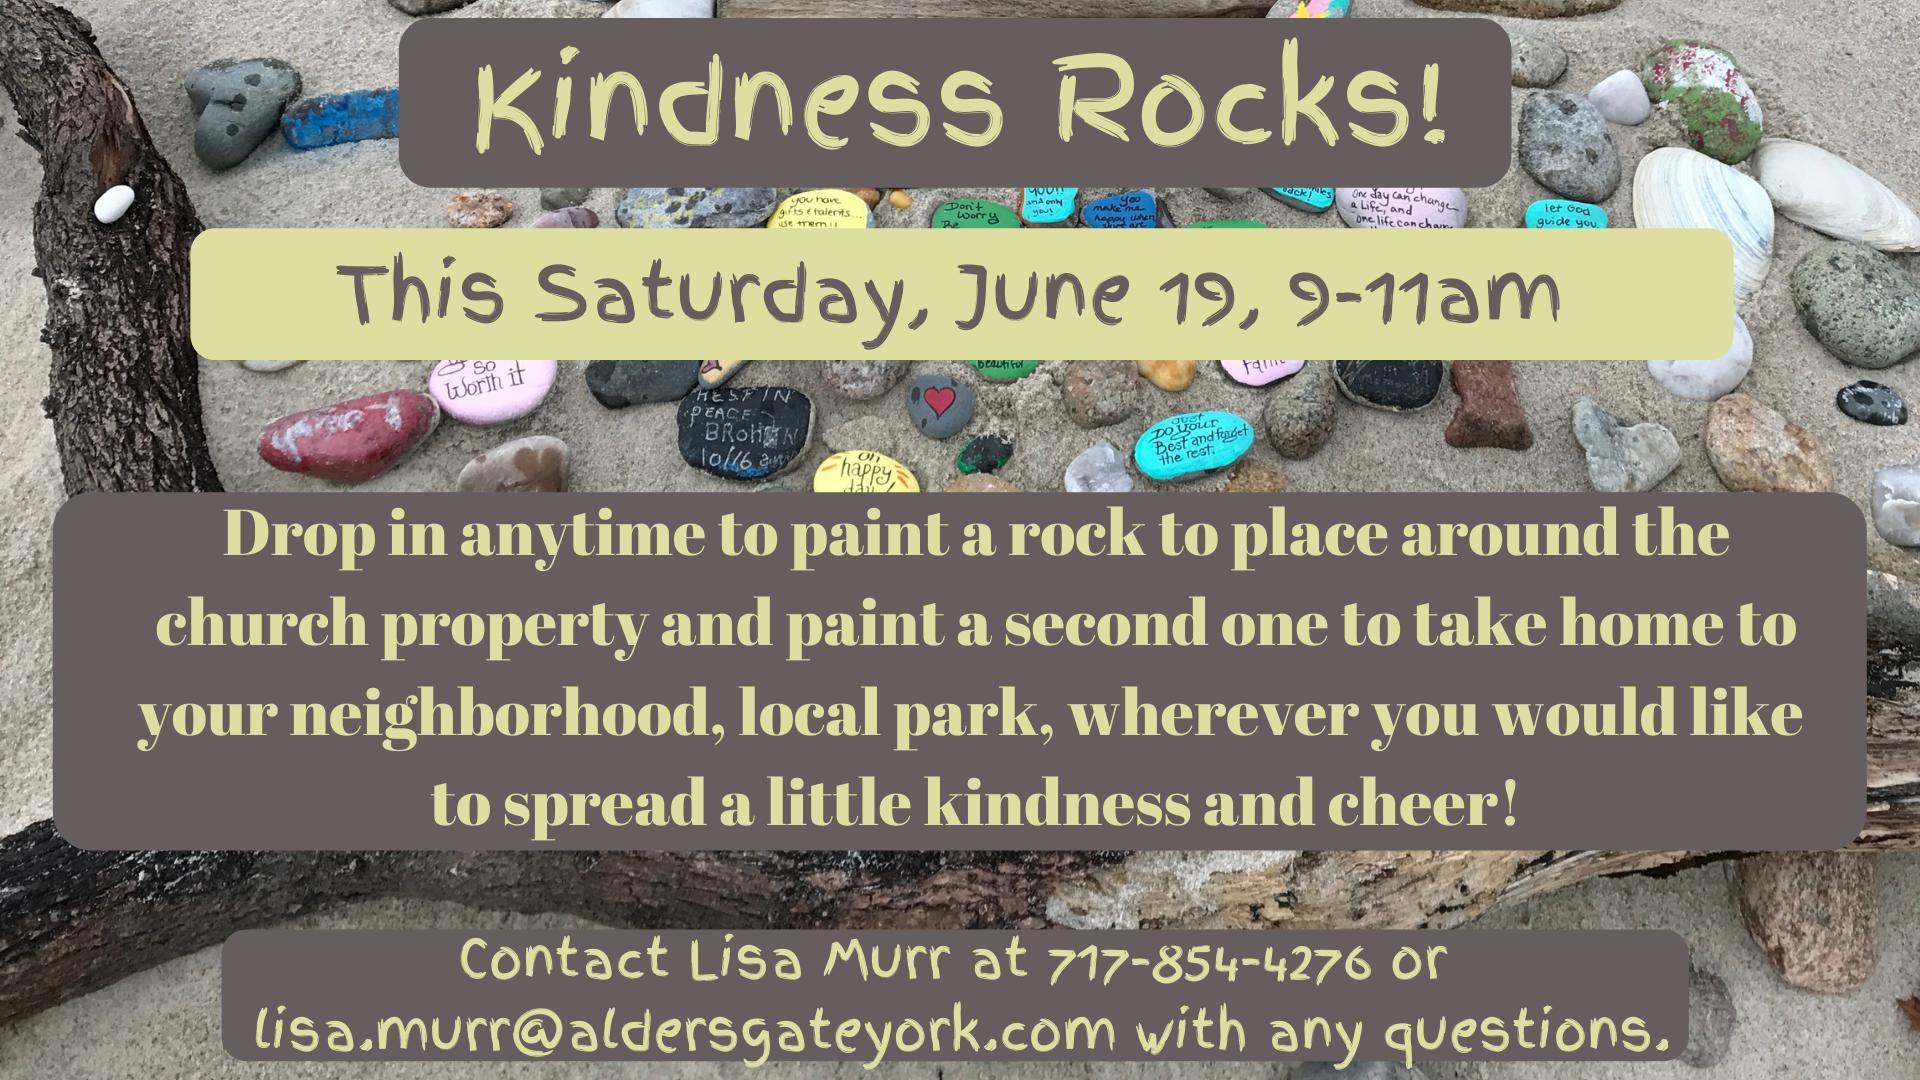 This Saturday, June 19th - Amazing Adventures Kindness Rocks! Event